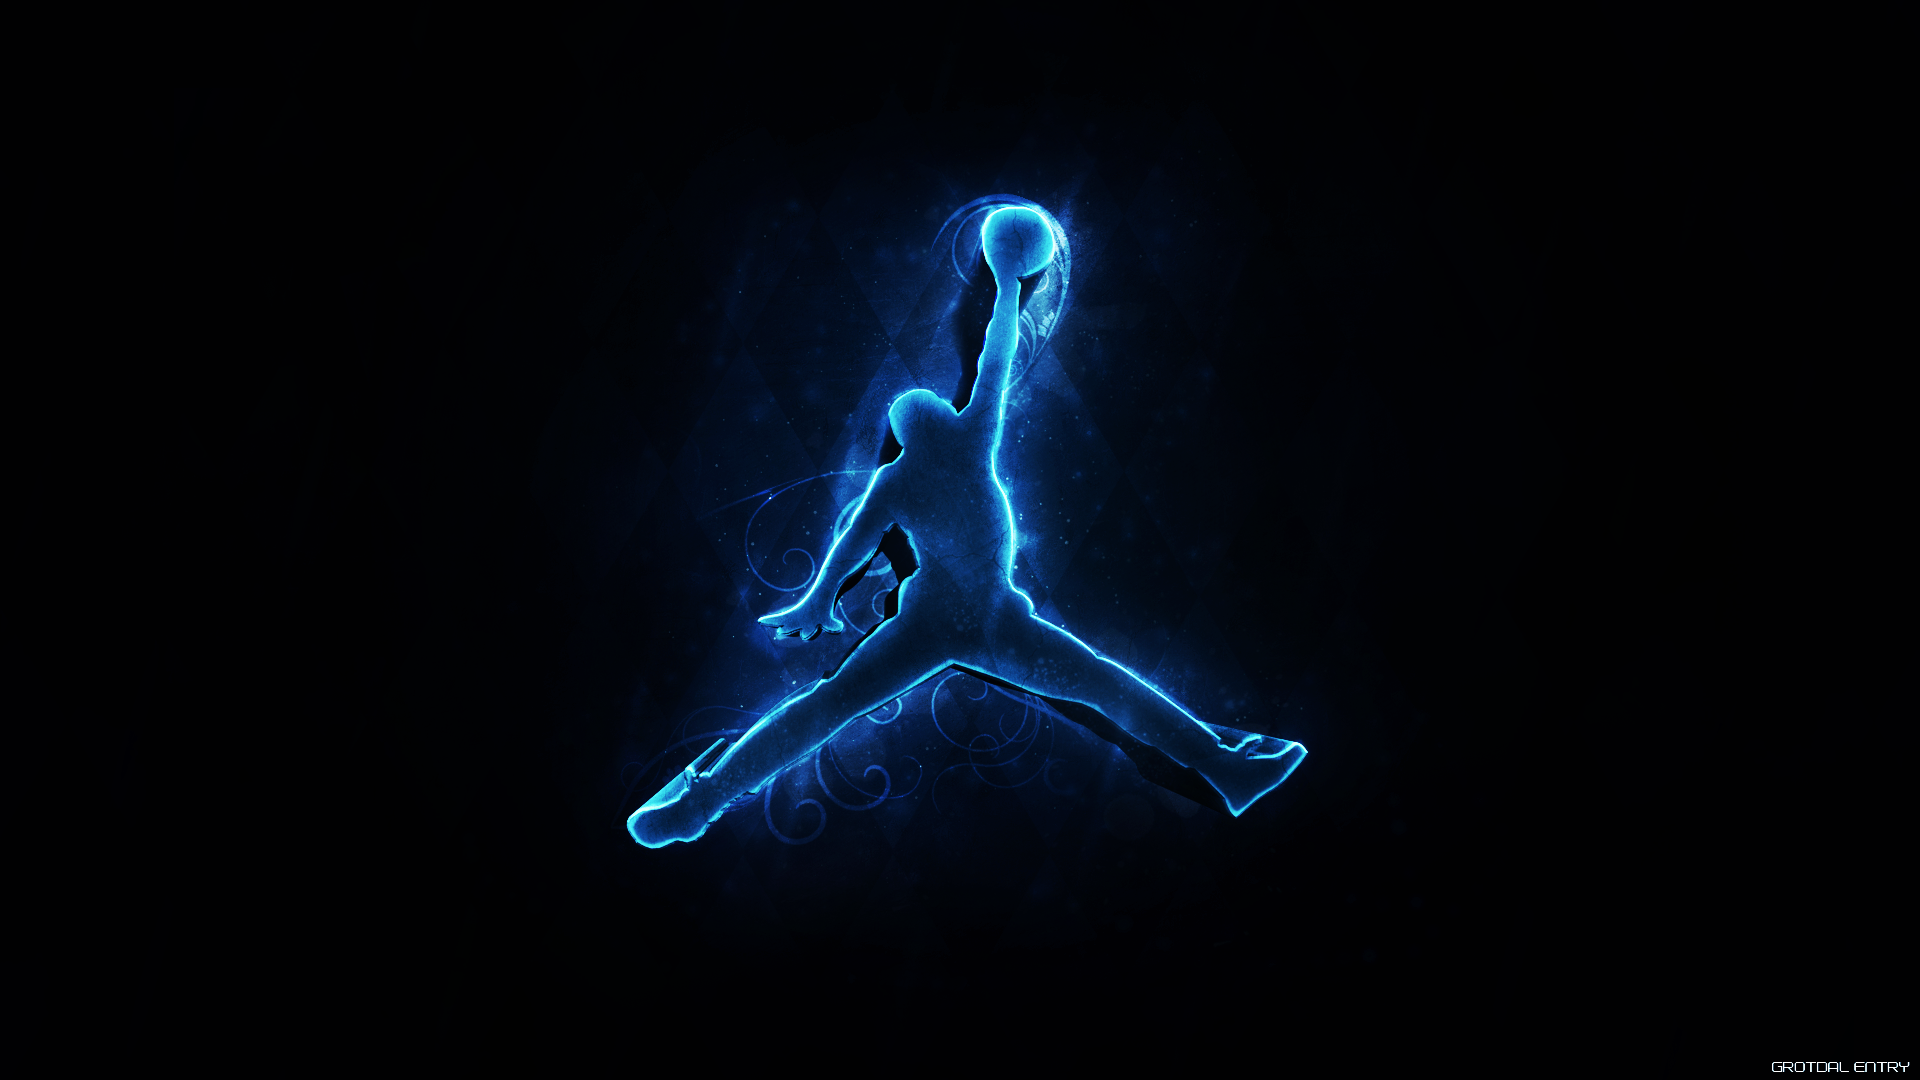 Air Jordan Logo Wallpaper Hd